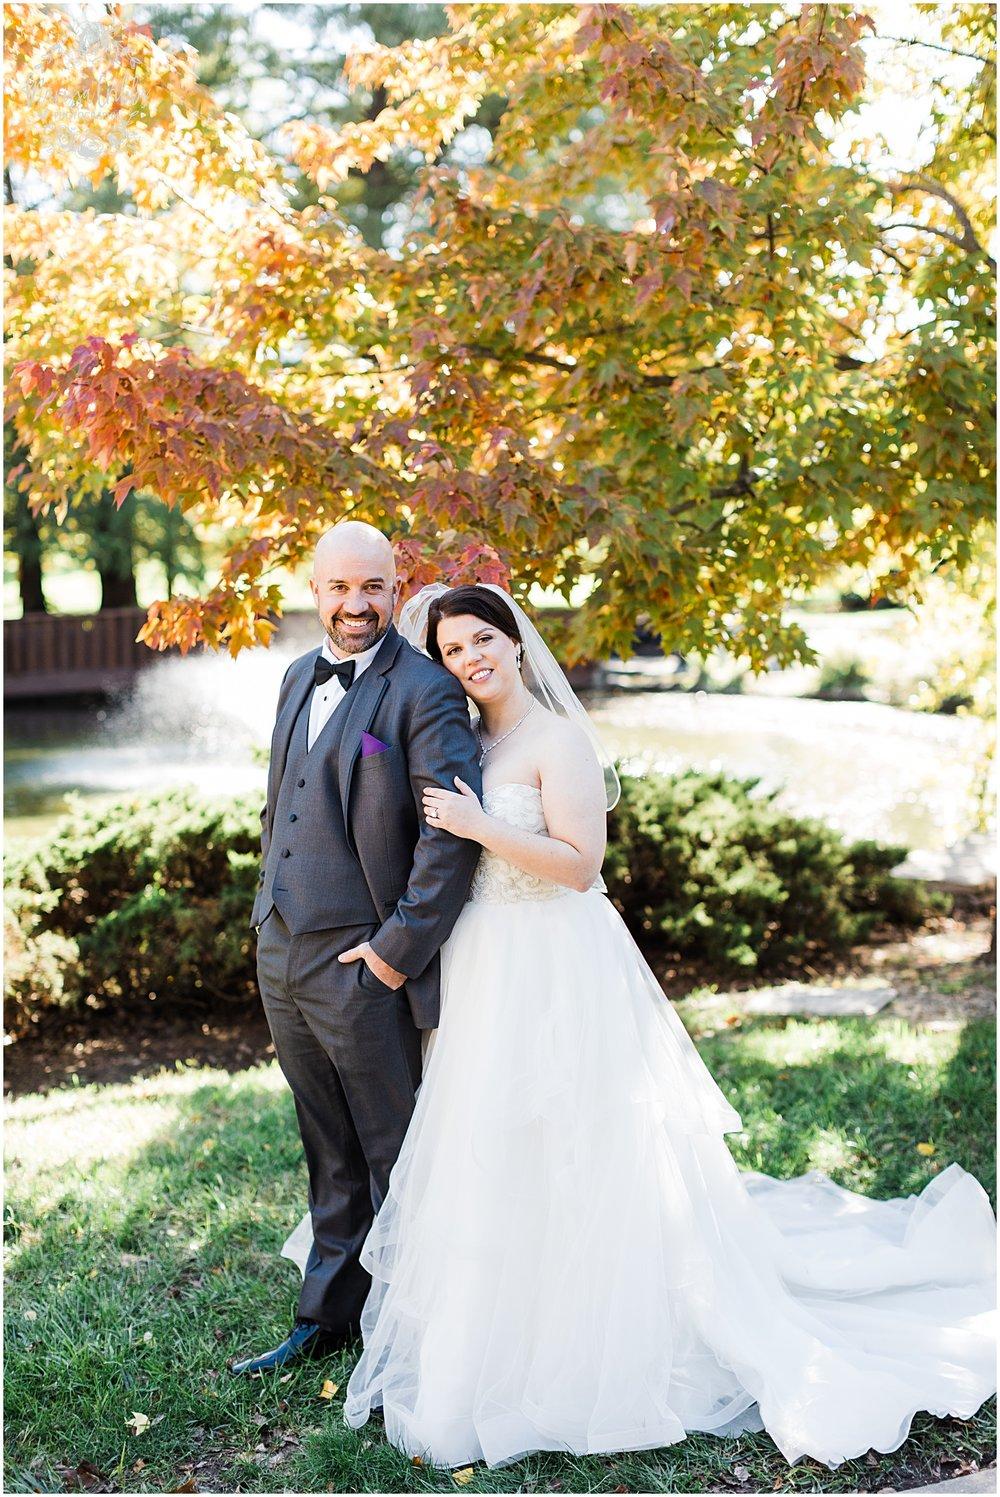 LAURA & DAN MARRIED | NELSON ATKINS MUSEUM | MARISSA CRIBBS PHOTOGRAPHY_7010.jpg